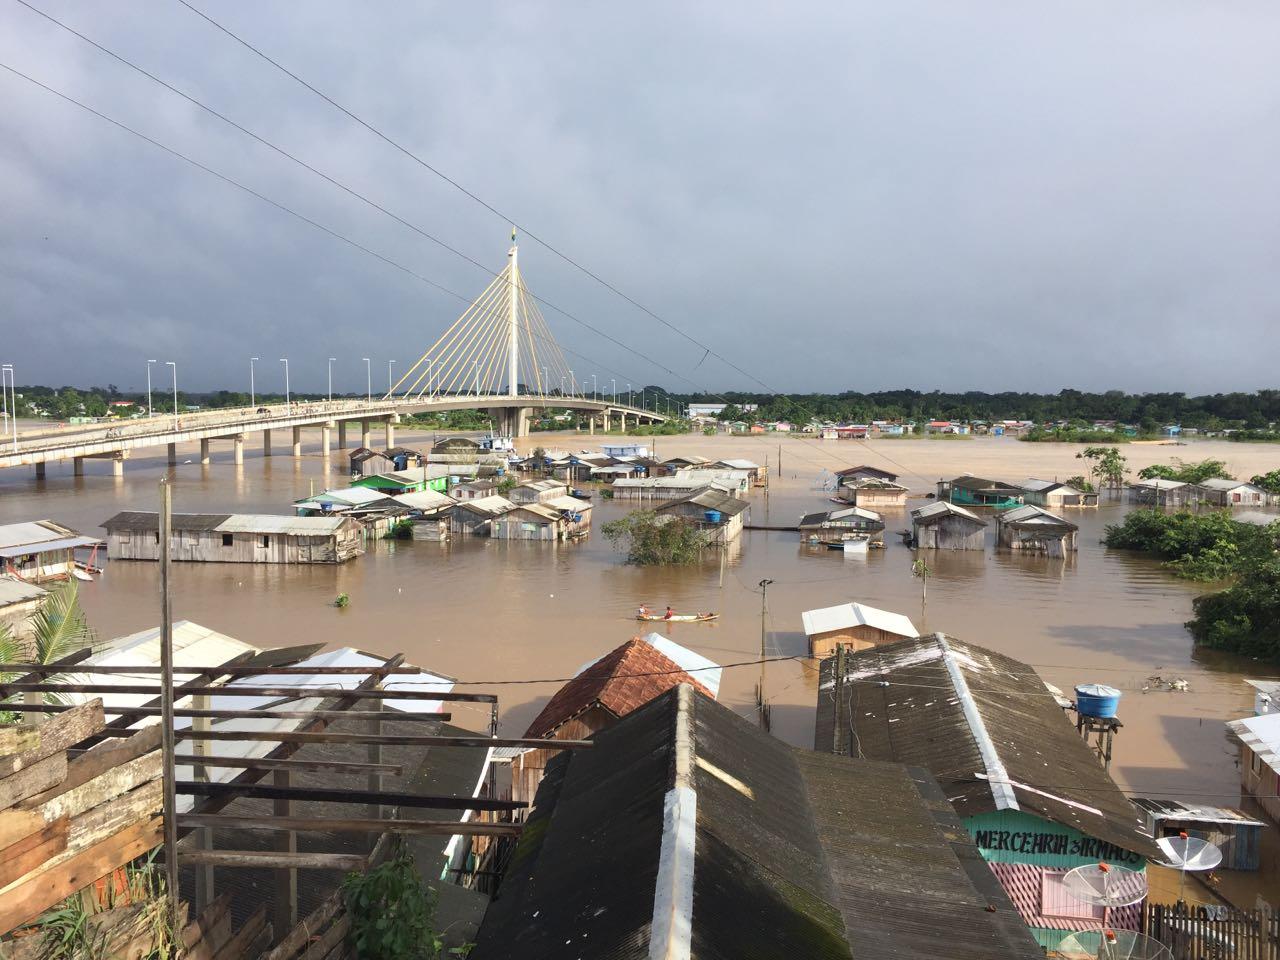 Many houses near the bridge flooded.